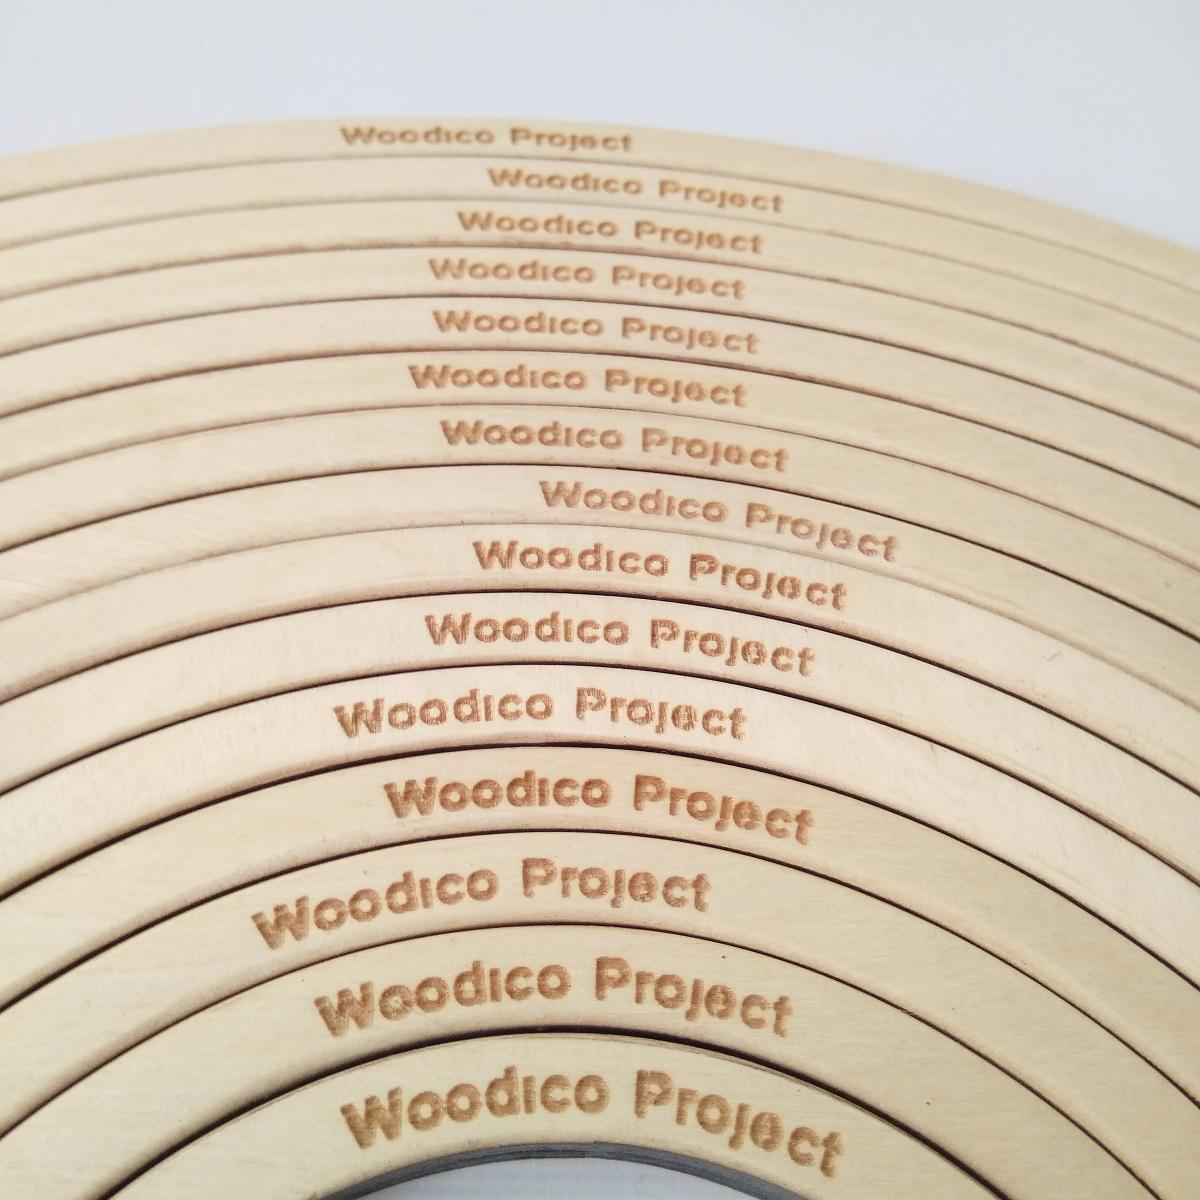 woodico.pro dream catcher base set of 15 rings 12 40 cm 17 1200x1200 - Dream catcher base / Set of 15 rings 12-40 cm